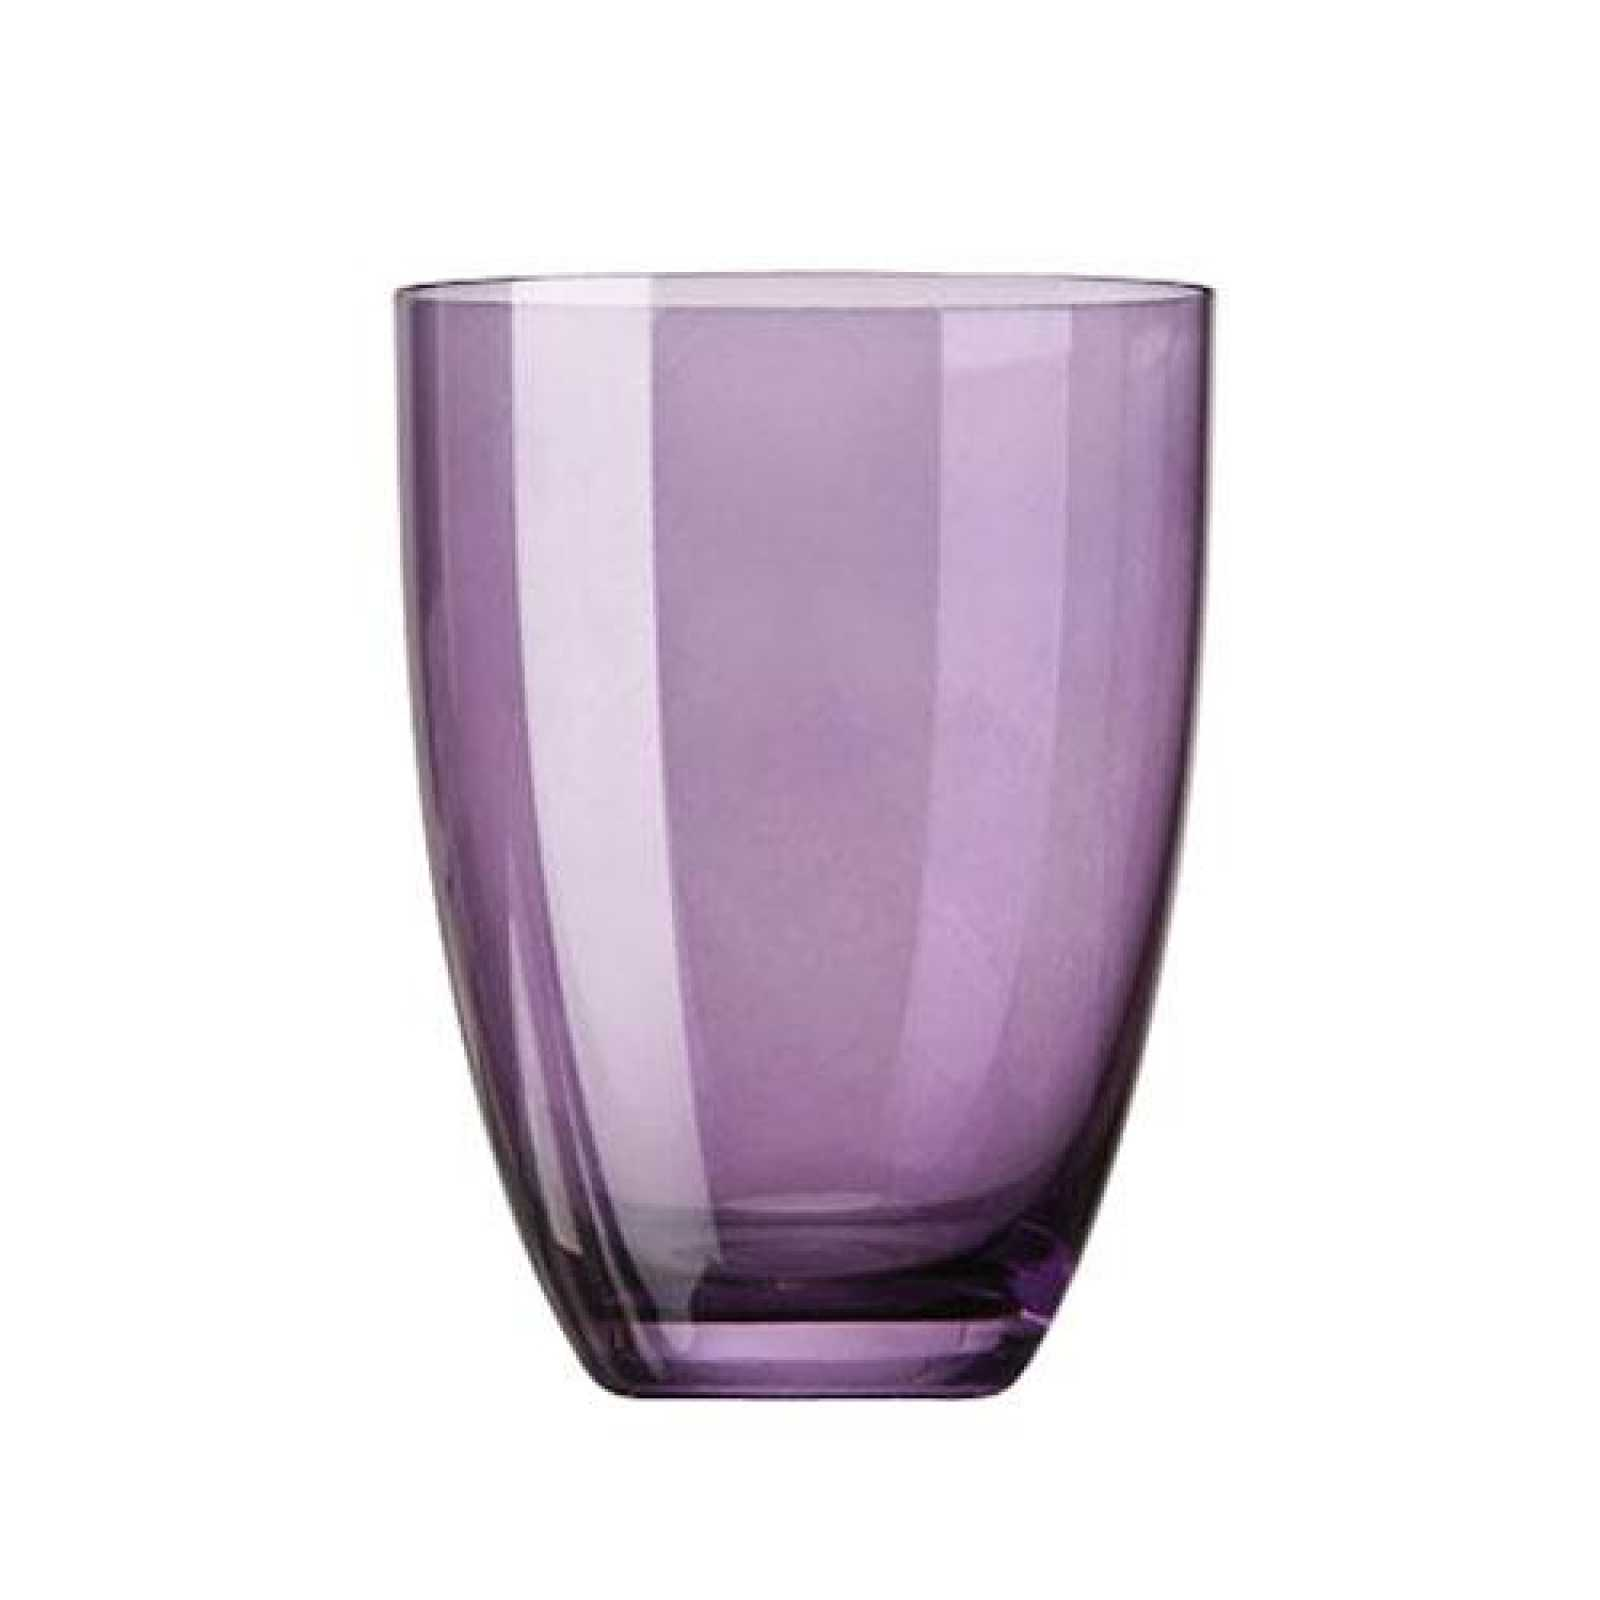 Онлайн каталог PROMENU: Стакан стеклянный Rosenthal SUNNY DAY, объем 0,32 л, фиолетовый Rosenthal 69034-408531-40140